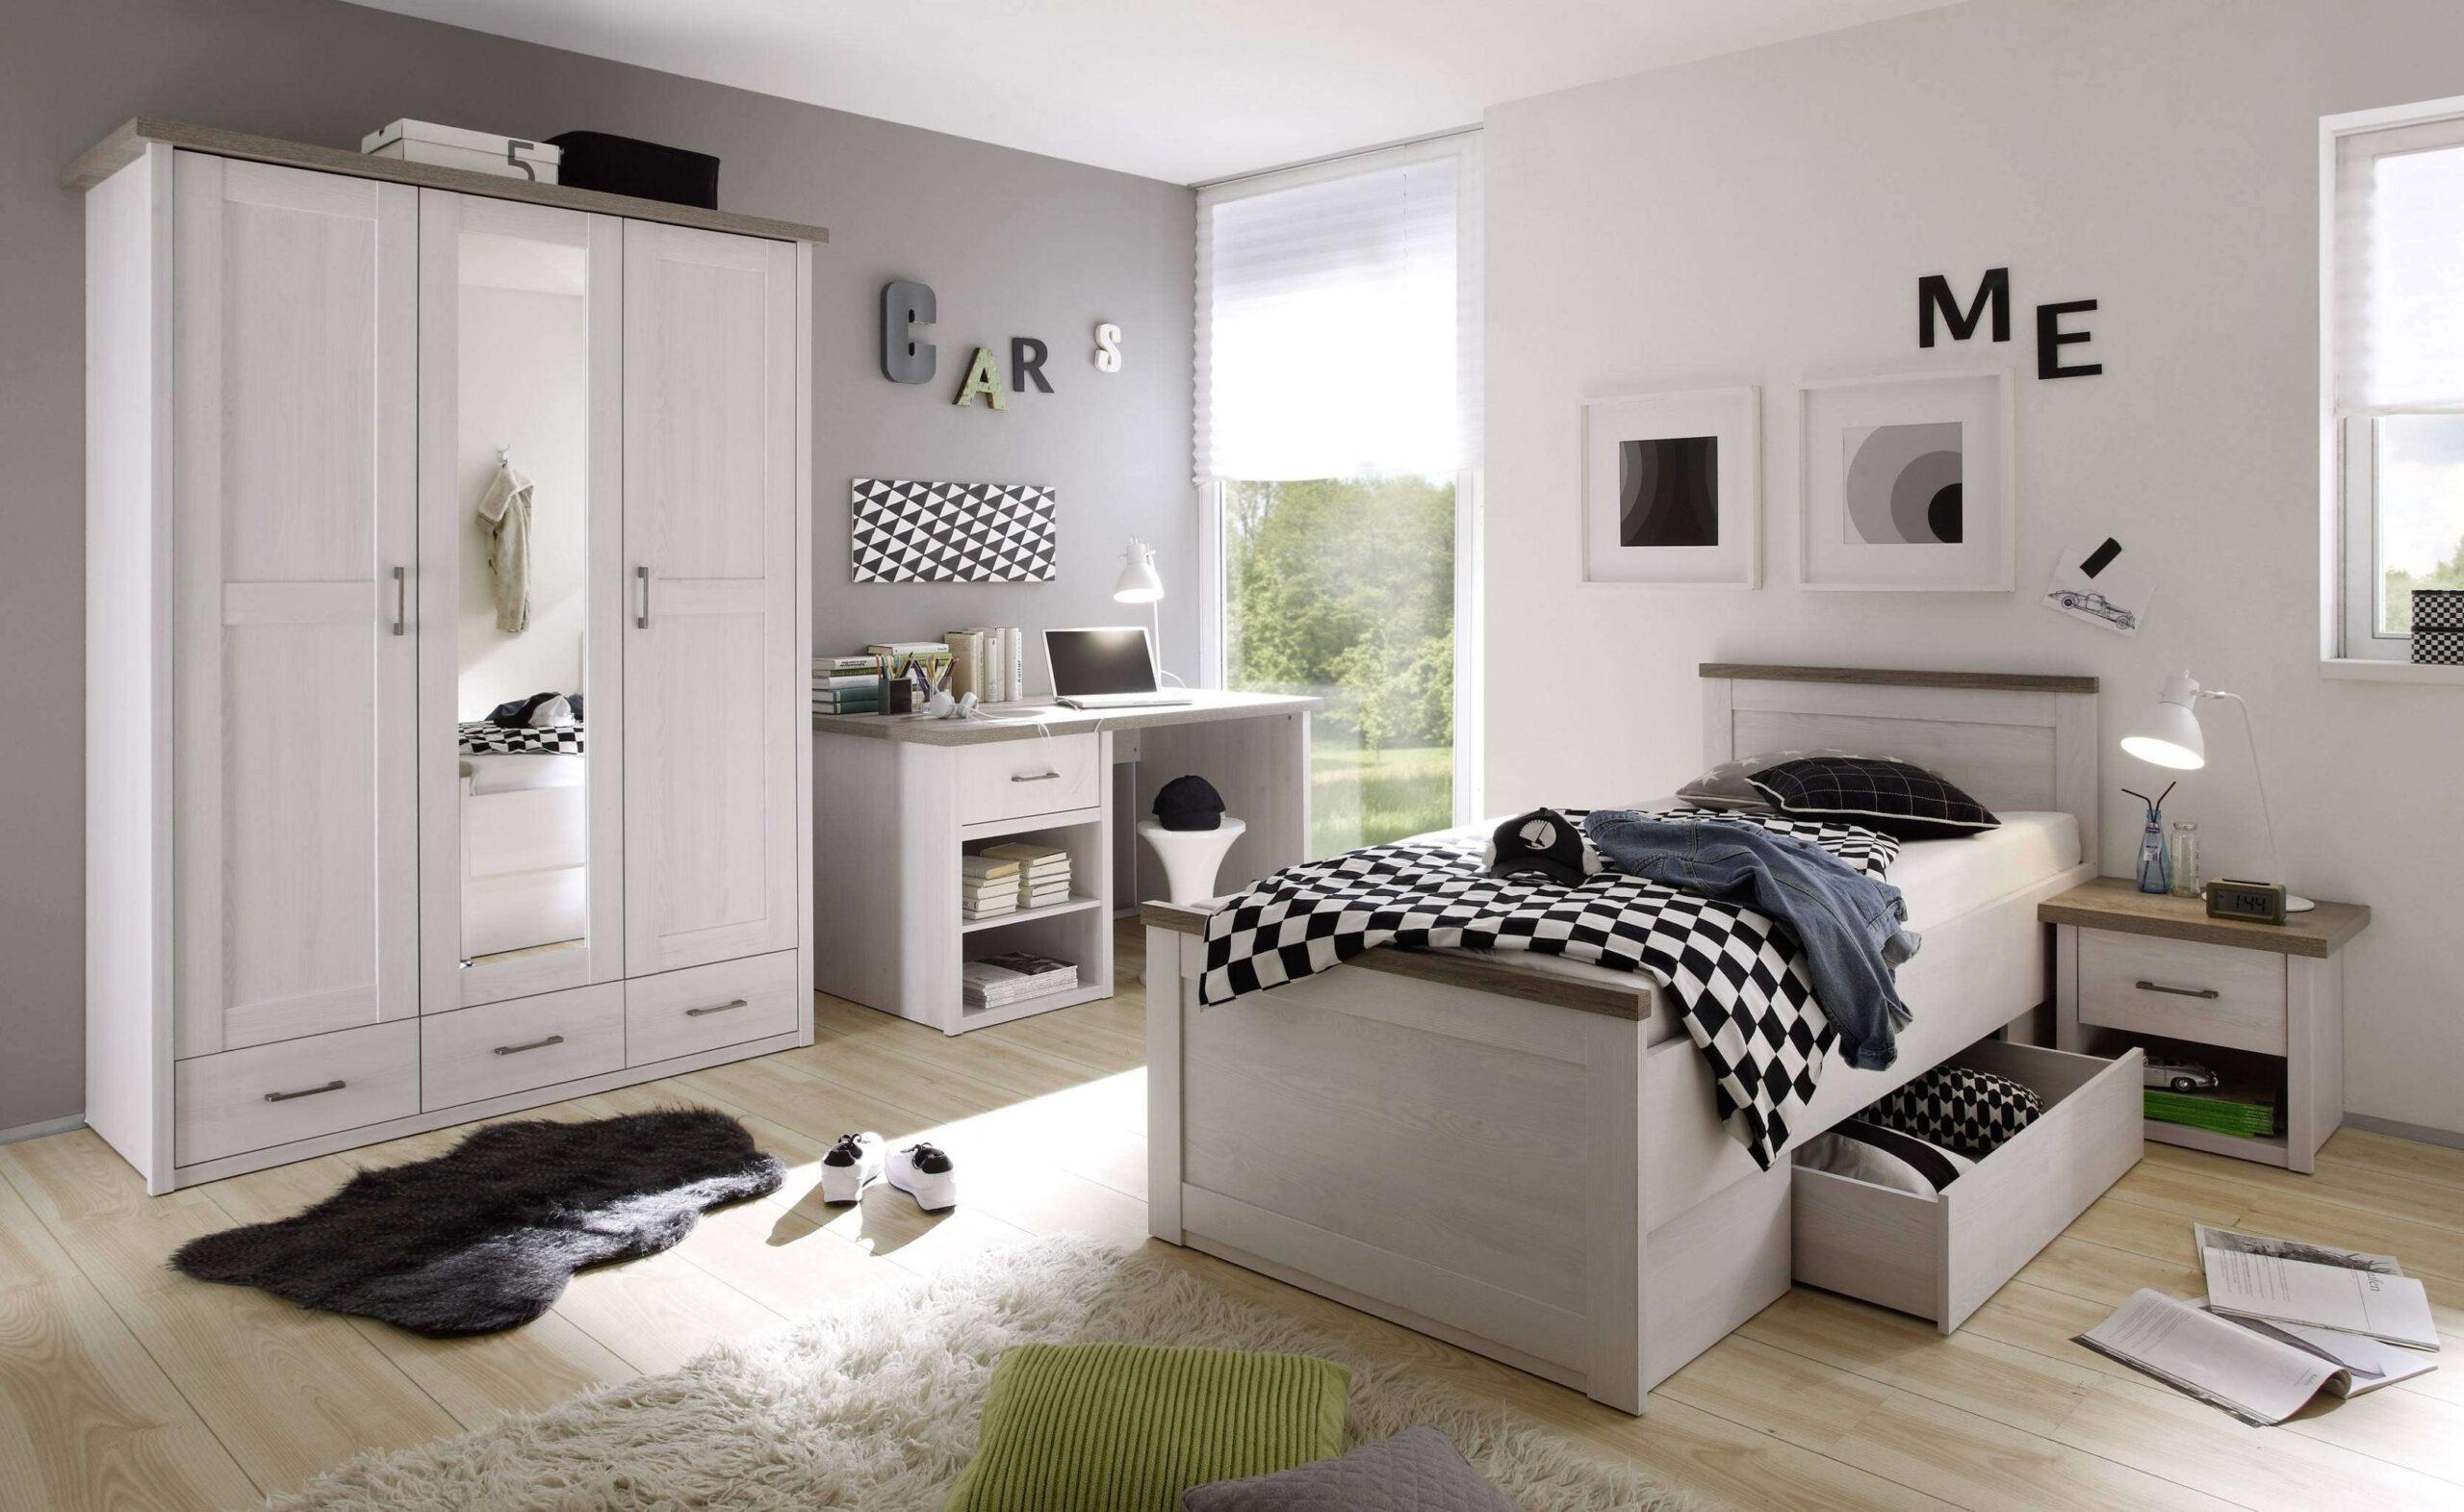 Full Size of Neu Jugendzimmer Komplett Ikea Cz Anleitung Beste Mbelideen Betten Bei Küche Kosten Kaufen Sofa 160x200 Mit Schlaffunktion Modulküche Bett Miniküche Wohnzimmer Jugendzimmer Ikea